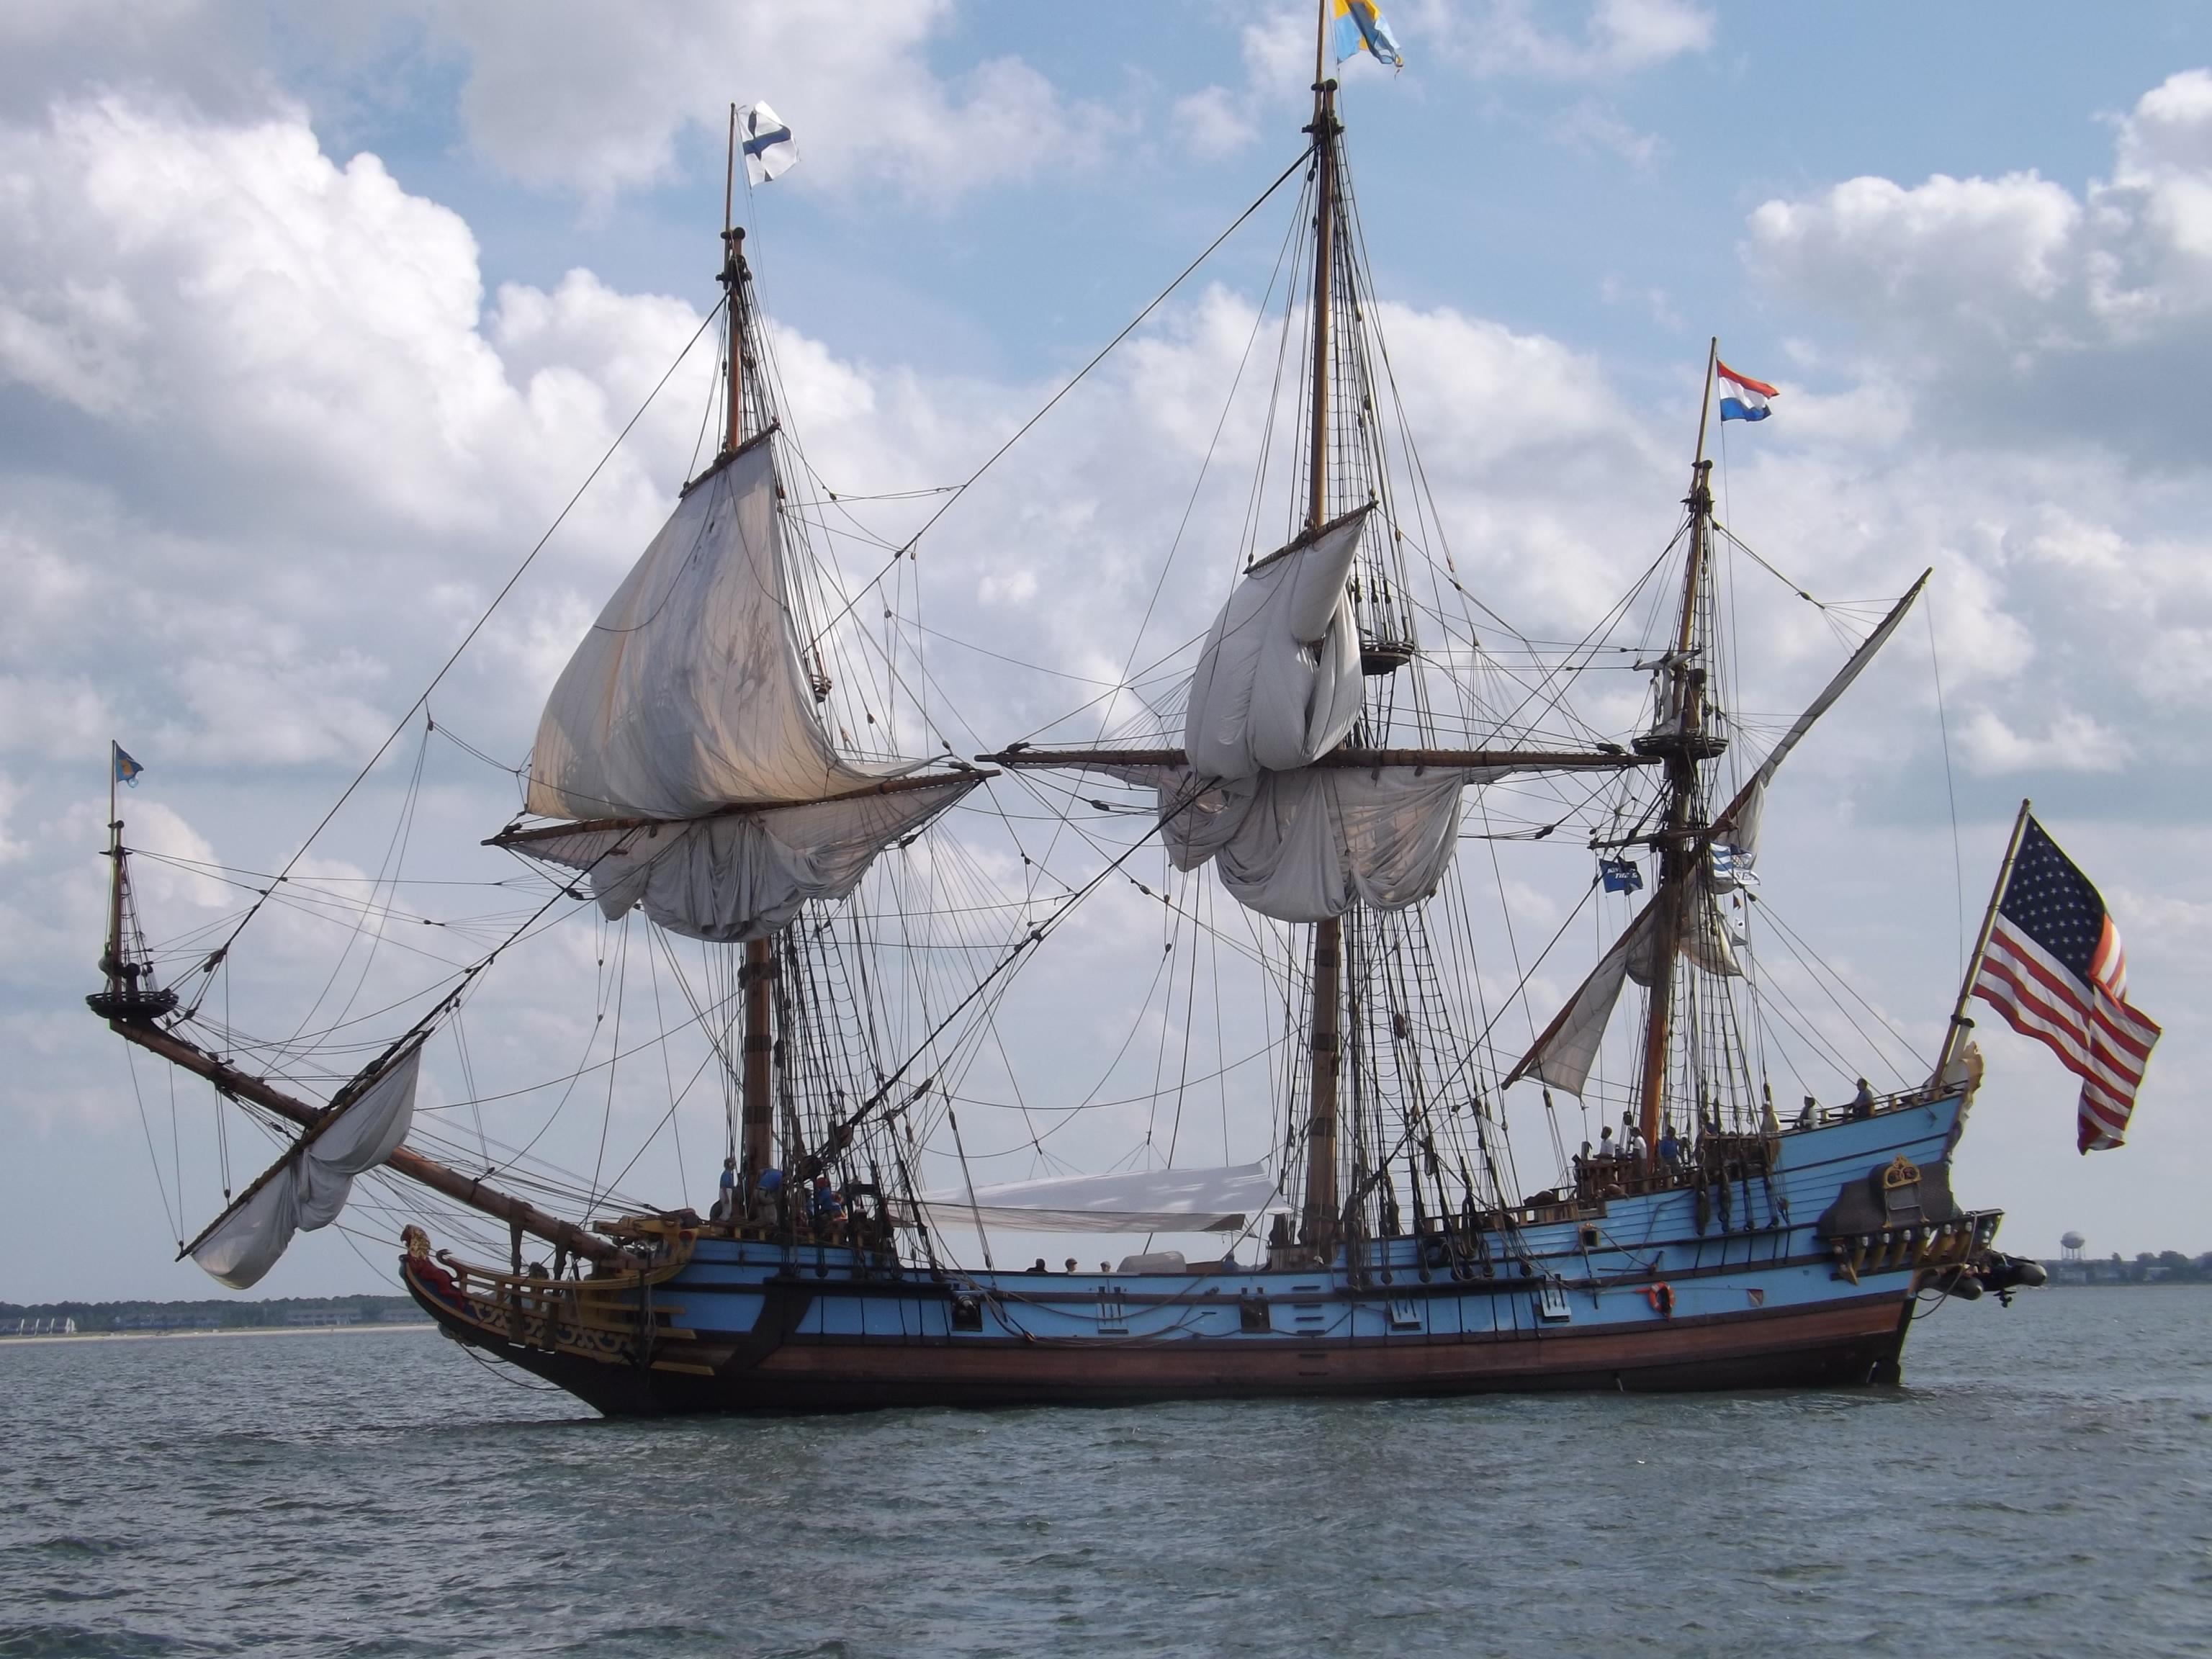 kalmar nykel, tall ships, delawares tall ship, de bay, sailing ships, 2 masted schooner,